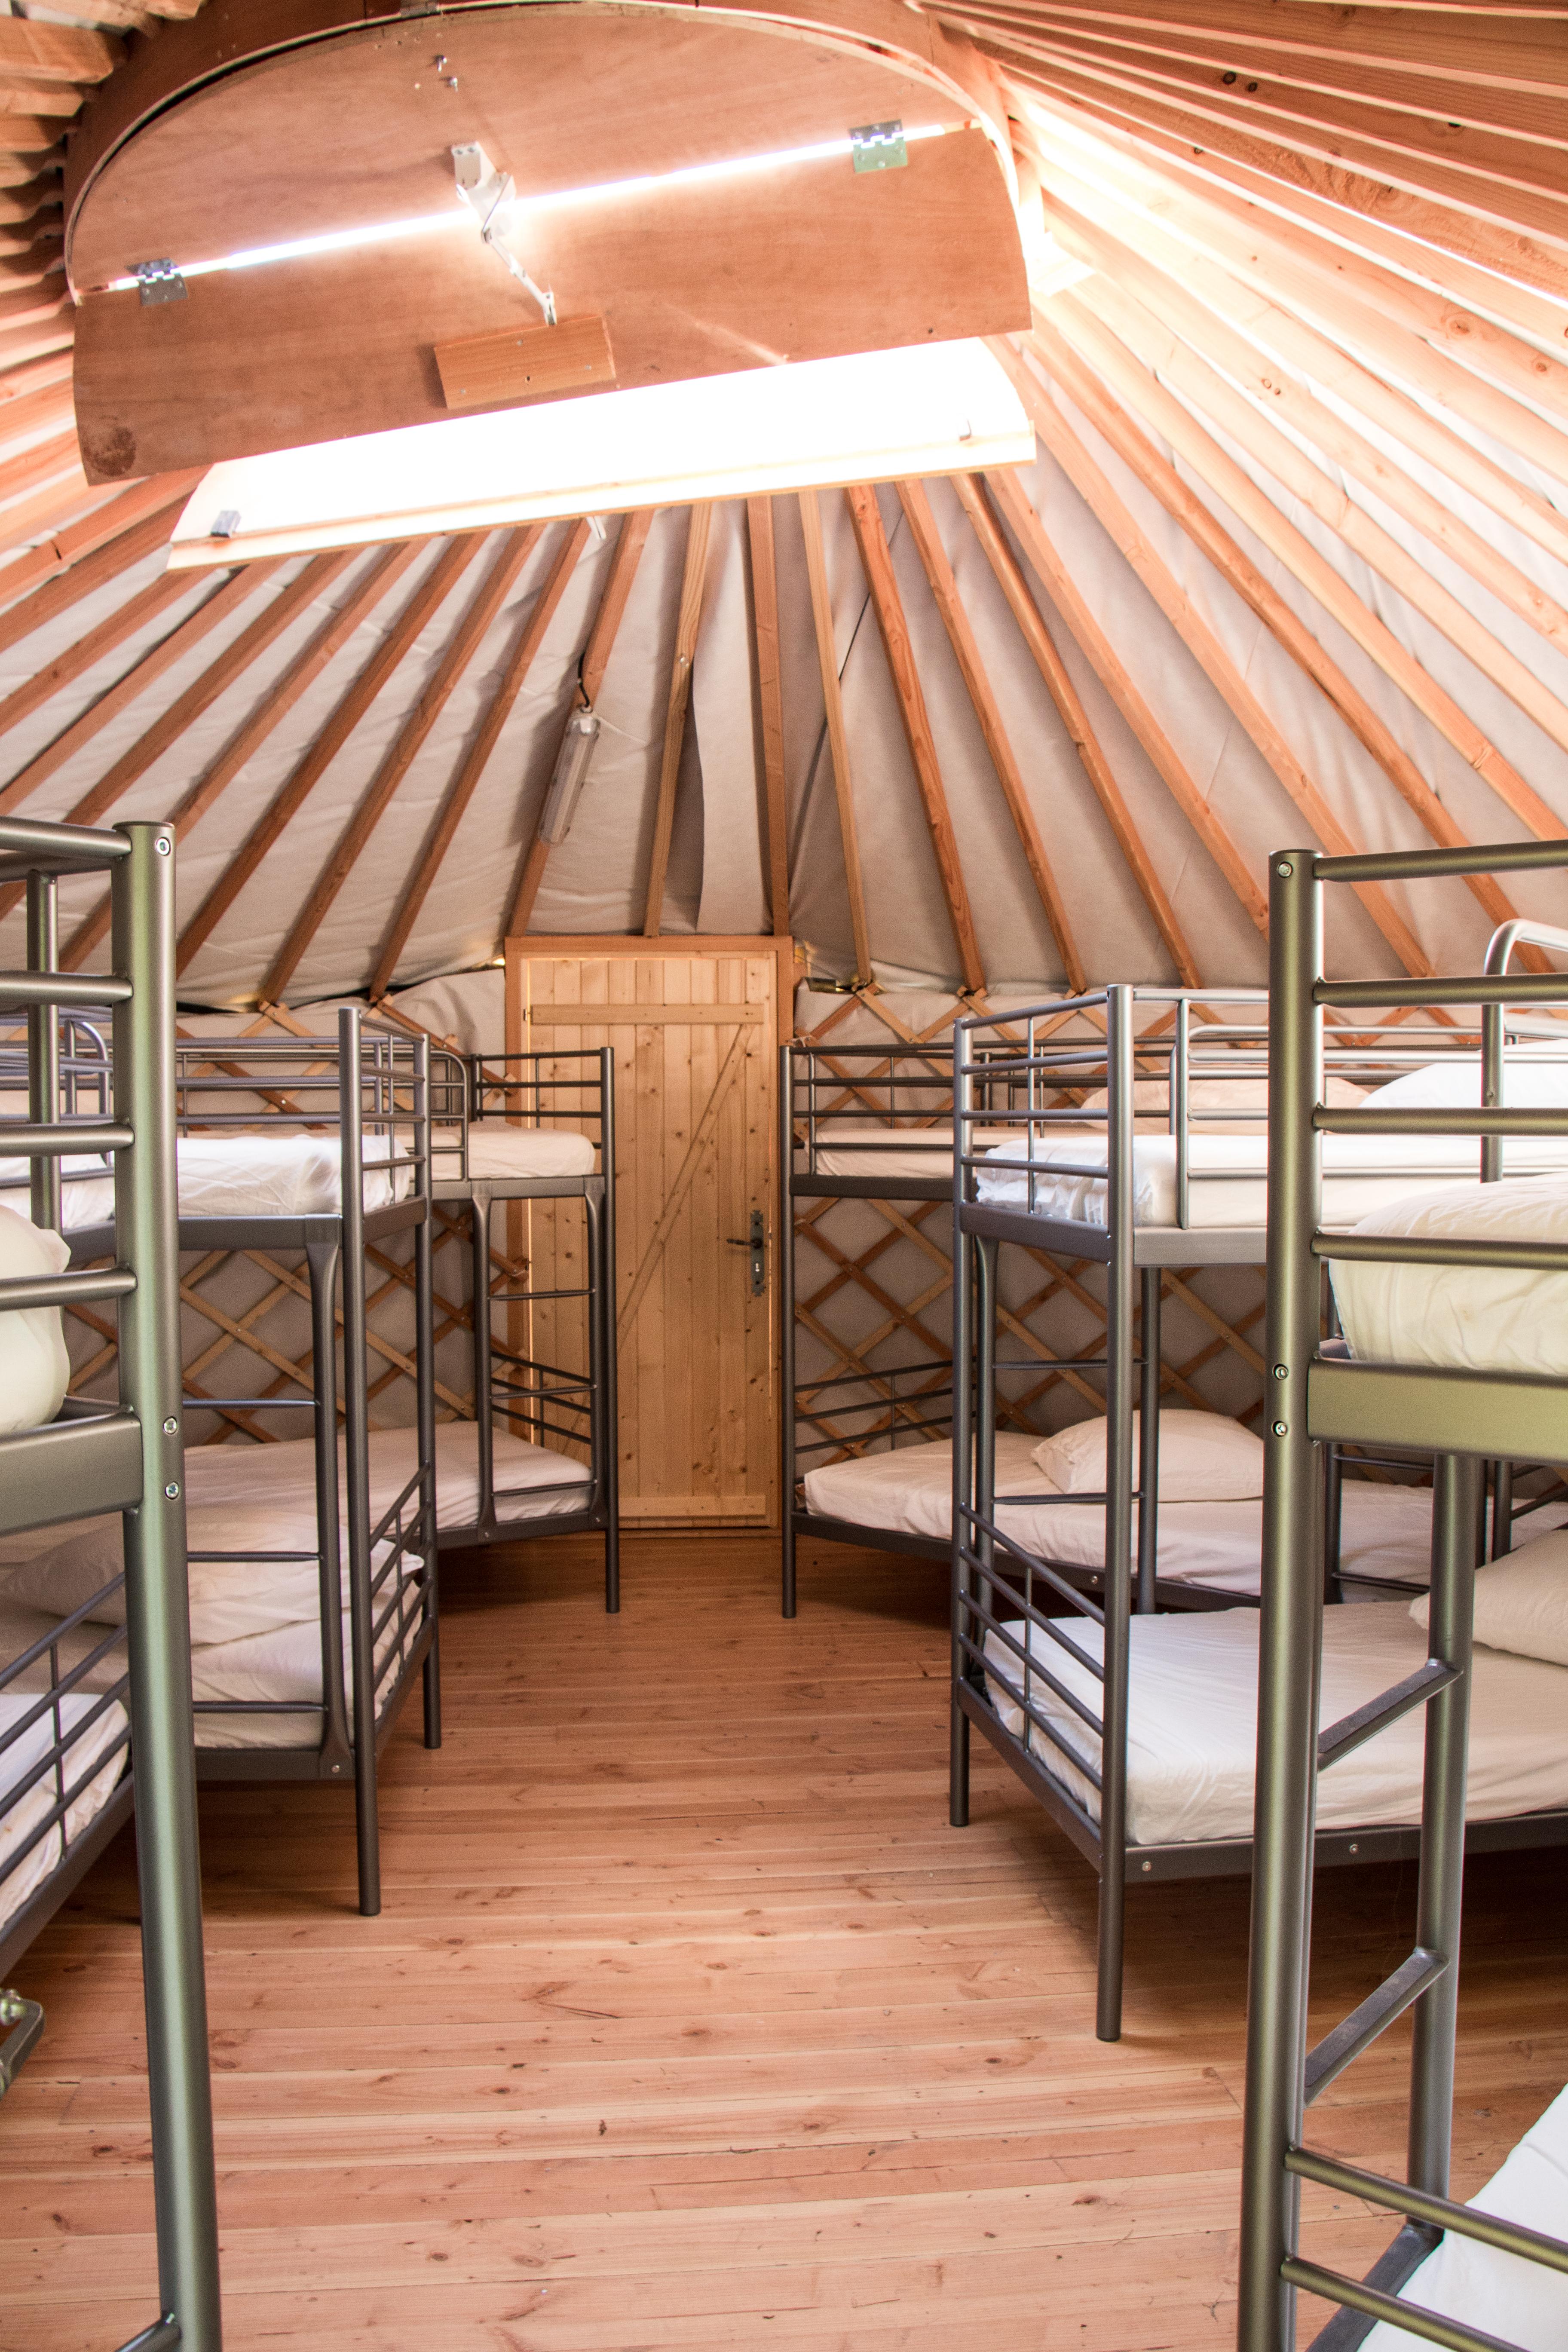 dortoir dans la yourte